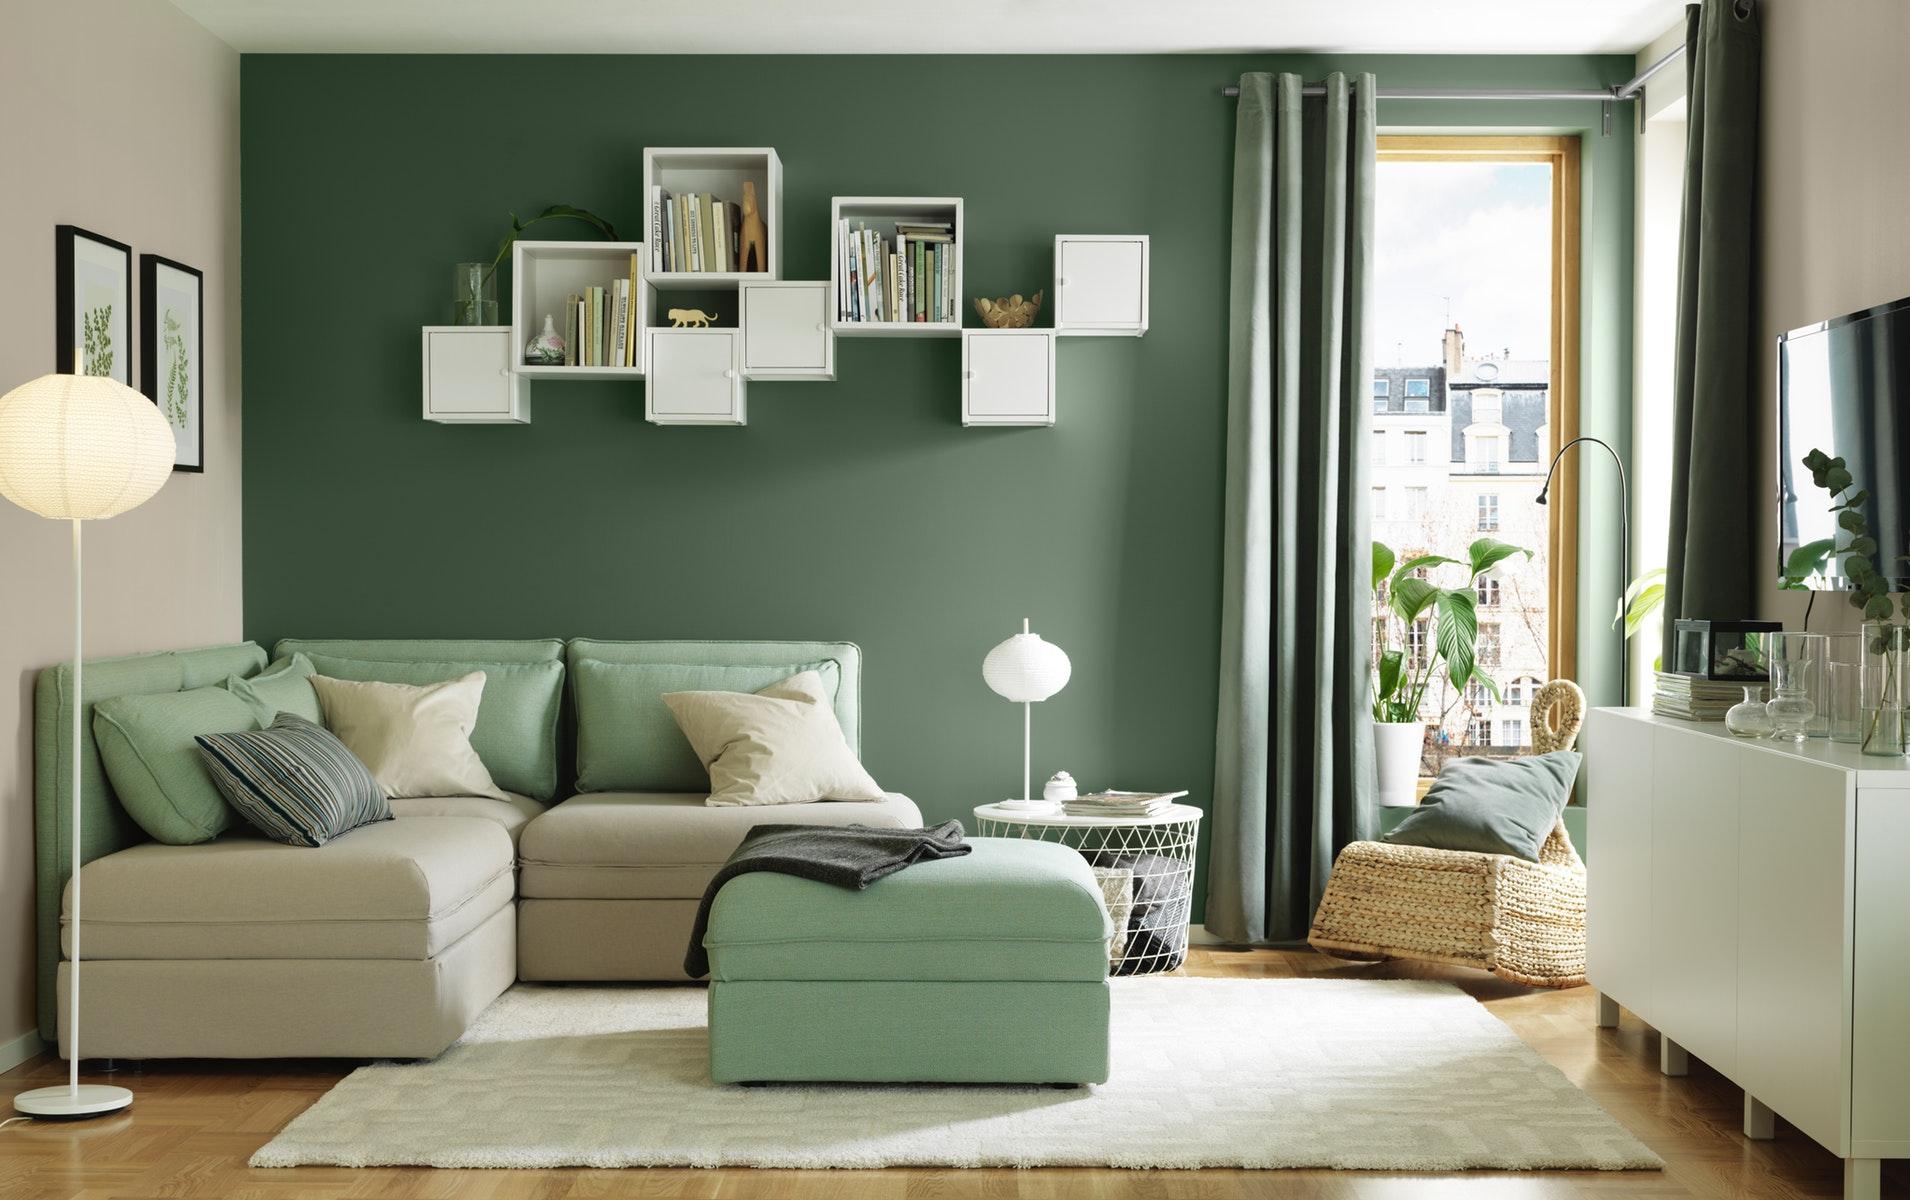 Tips Ide Dekorasi Ruang Tamu Minimalis untuk Rumah Kecil  IKEA